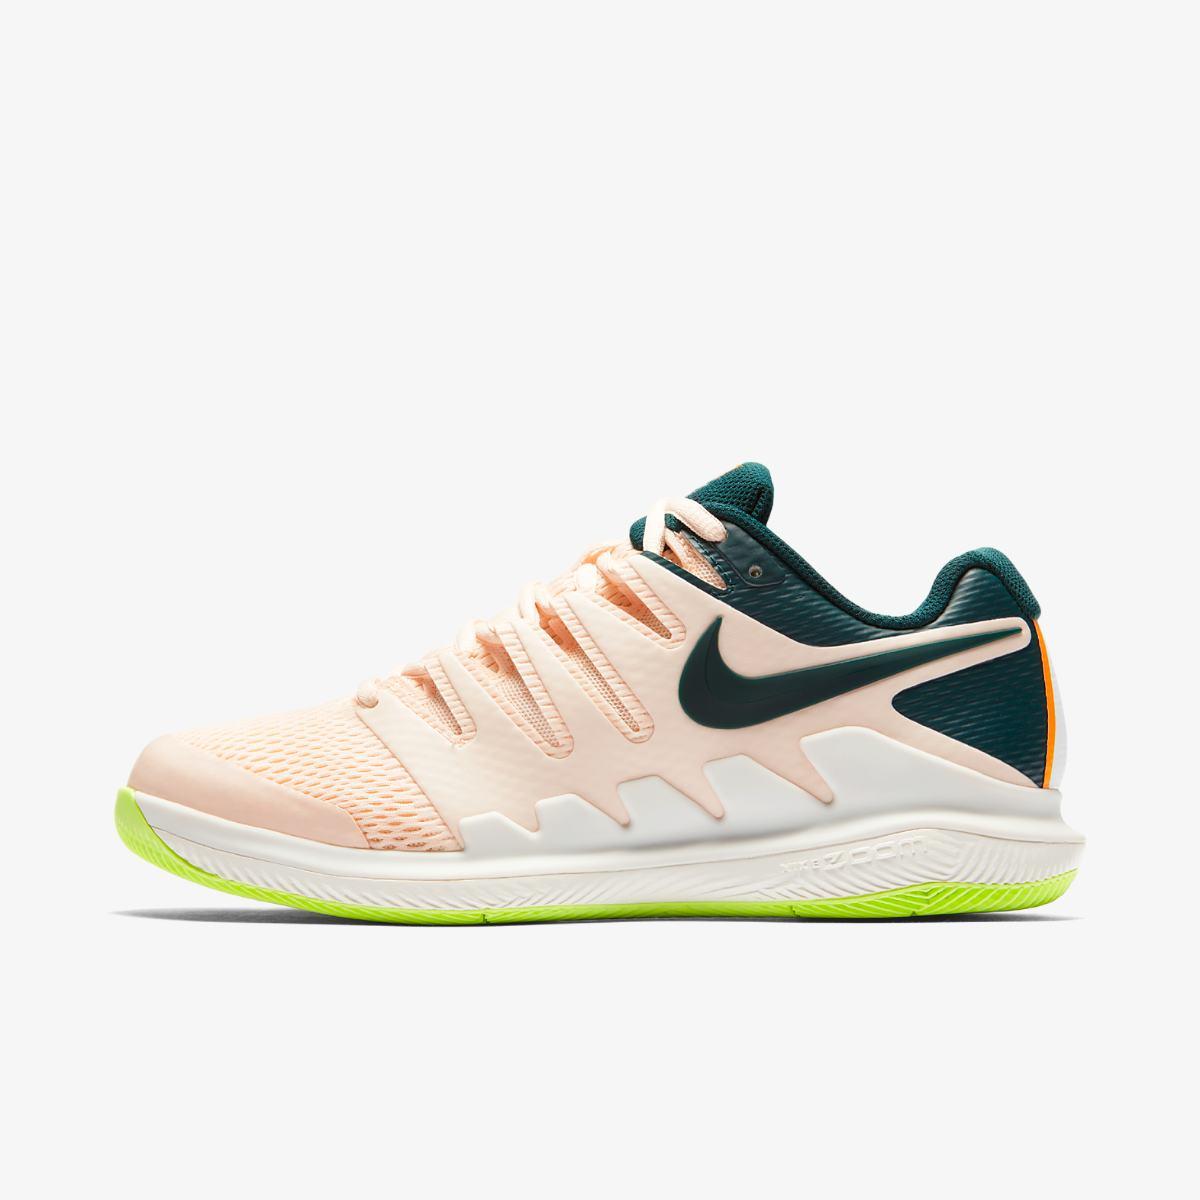 3cab551674d7 Кроссовки для тенниса Nike WMNS AIR ZOOM VAPOR X HC AA8027-802 ...